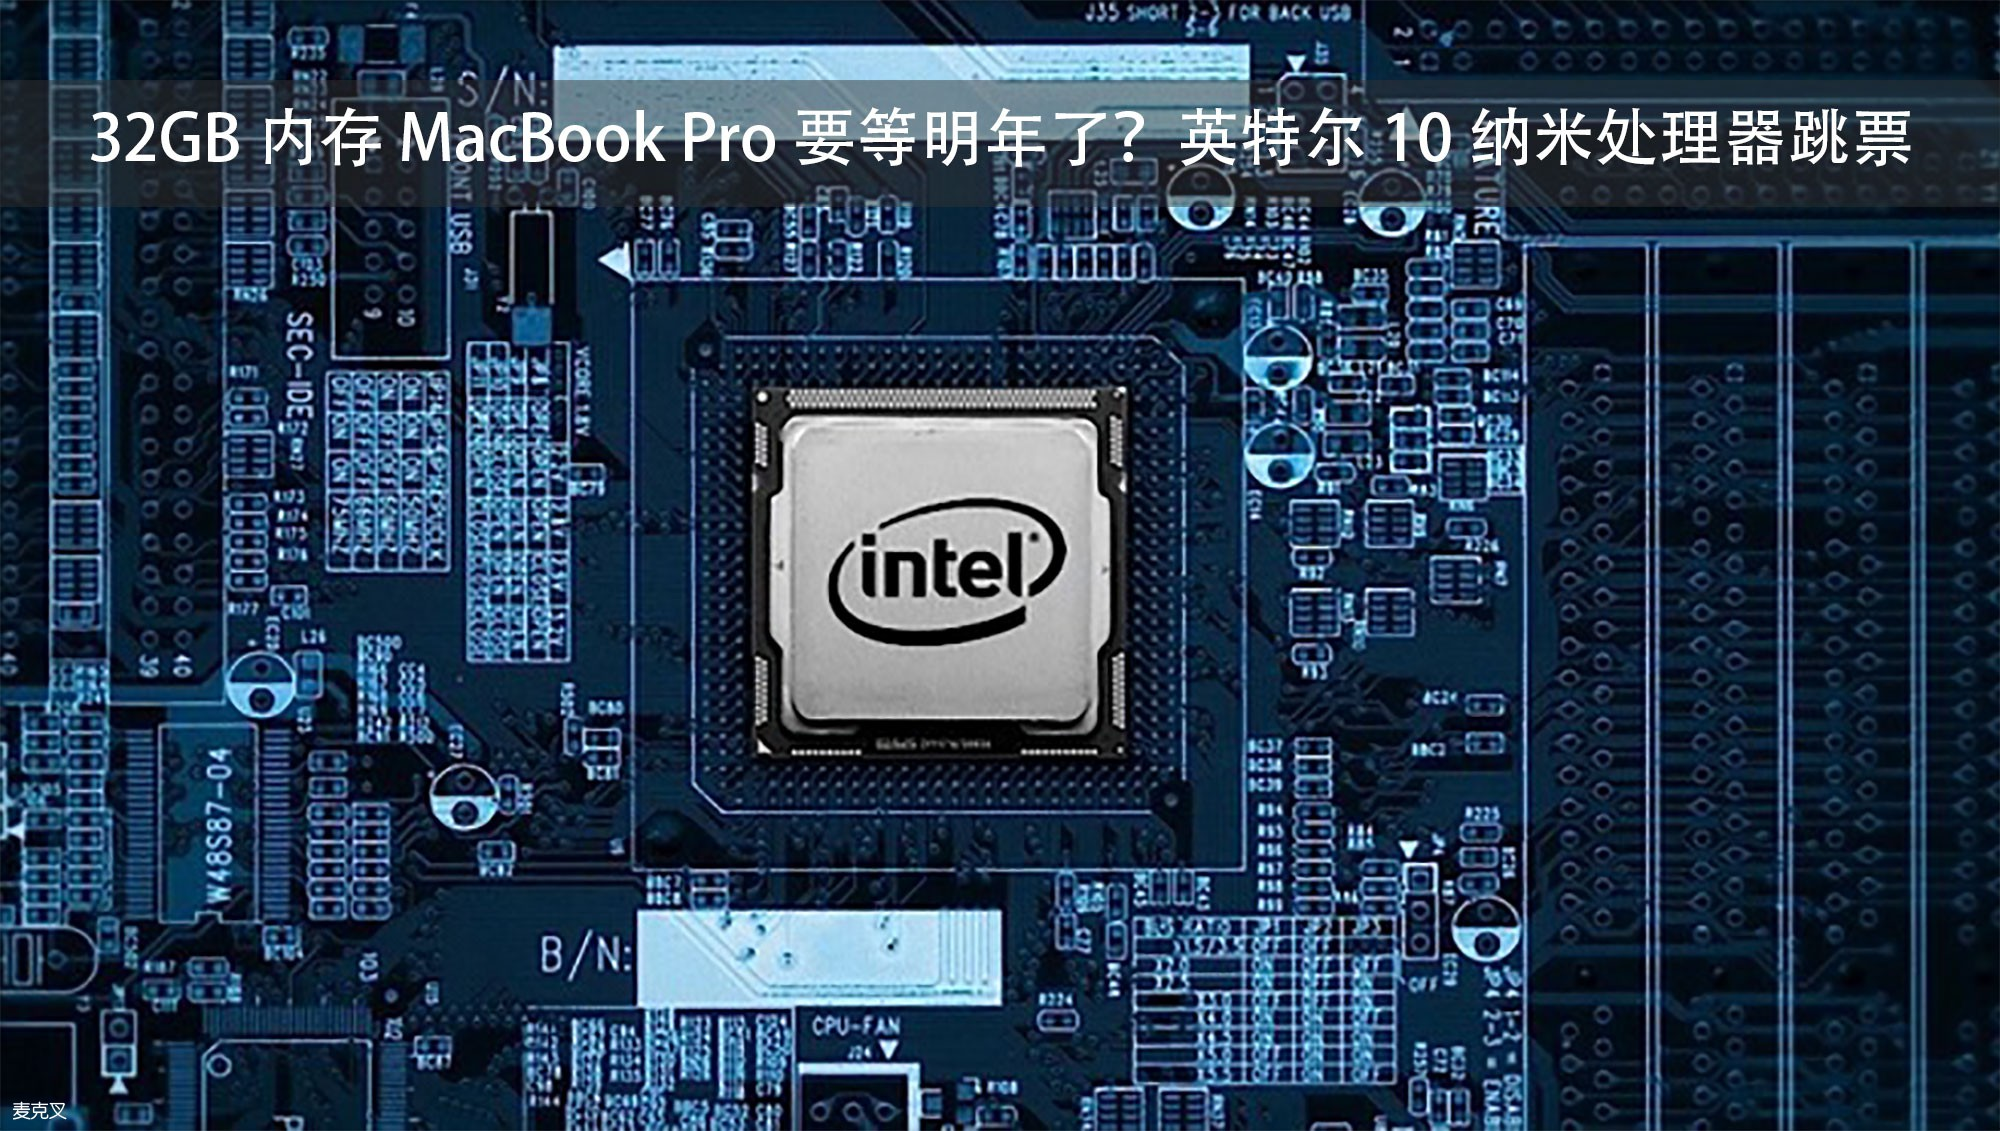 32GB 内存 MacBook Pro 要等明年了?英特尔 10 纳米处理器跳票